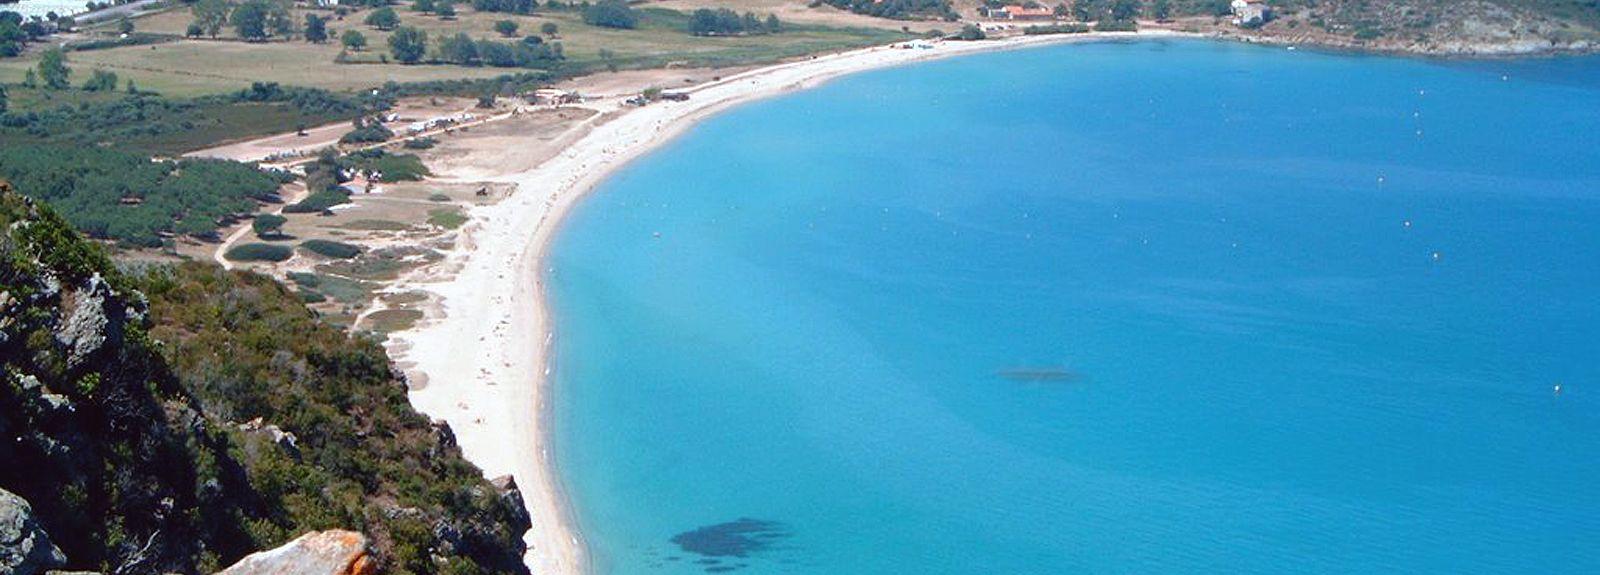 Strand von L'Ile Rousse, L'Ile-Rousse, Korsika, Frankreich